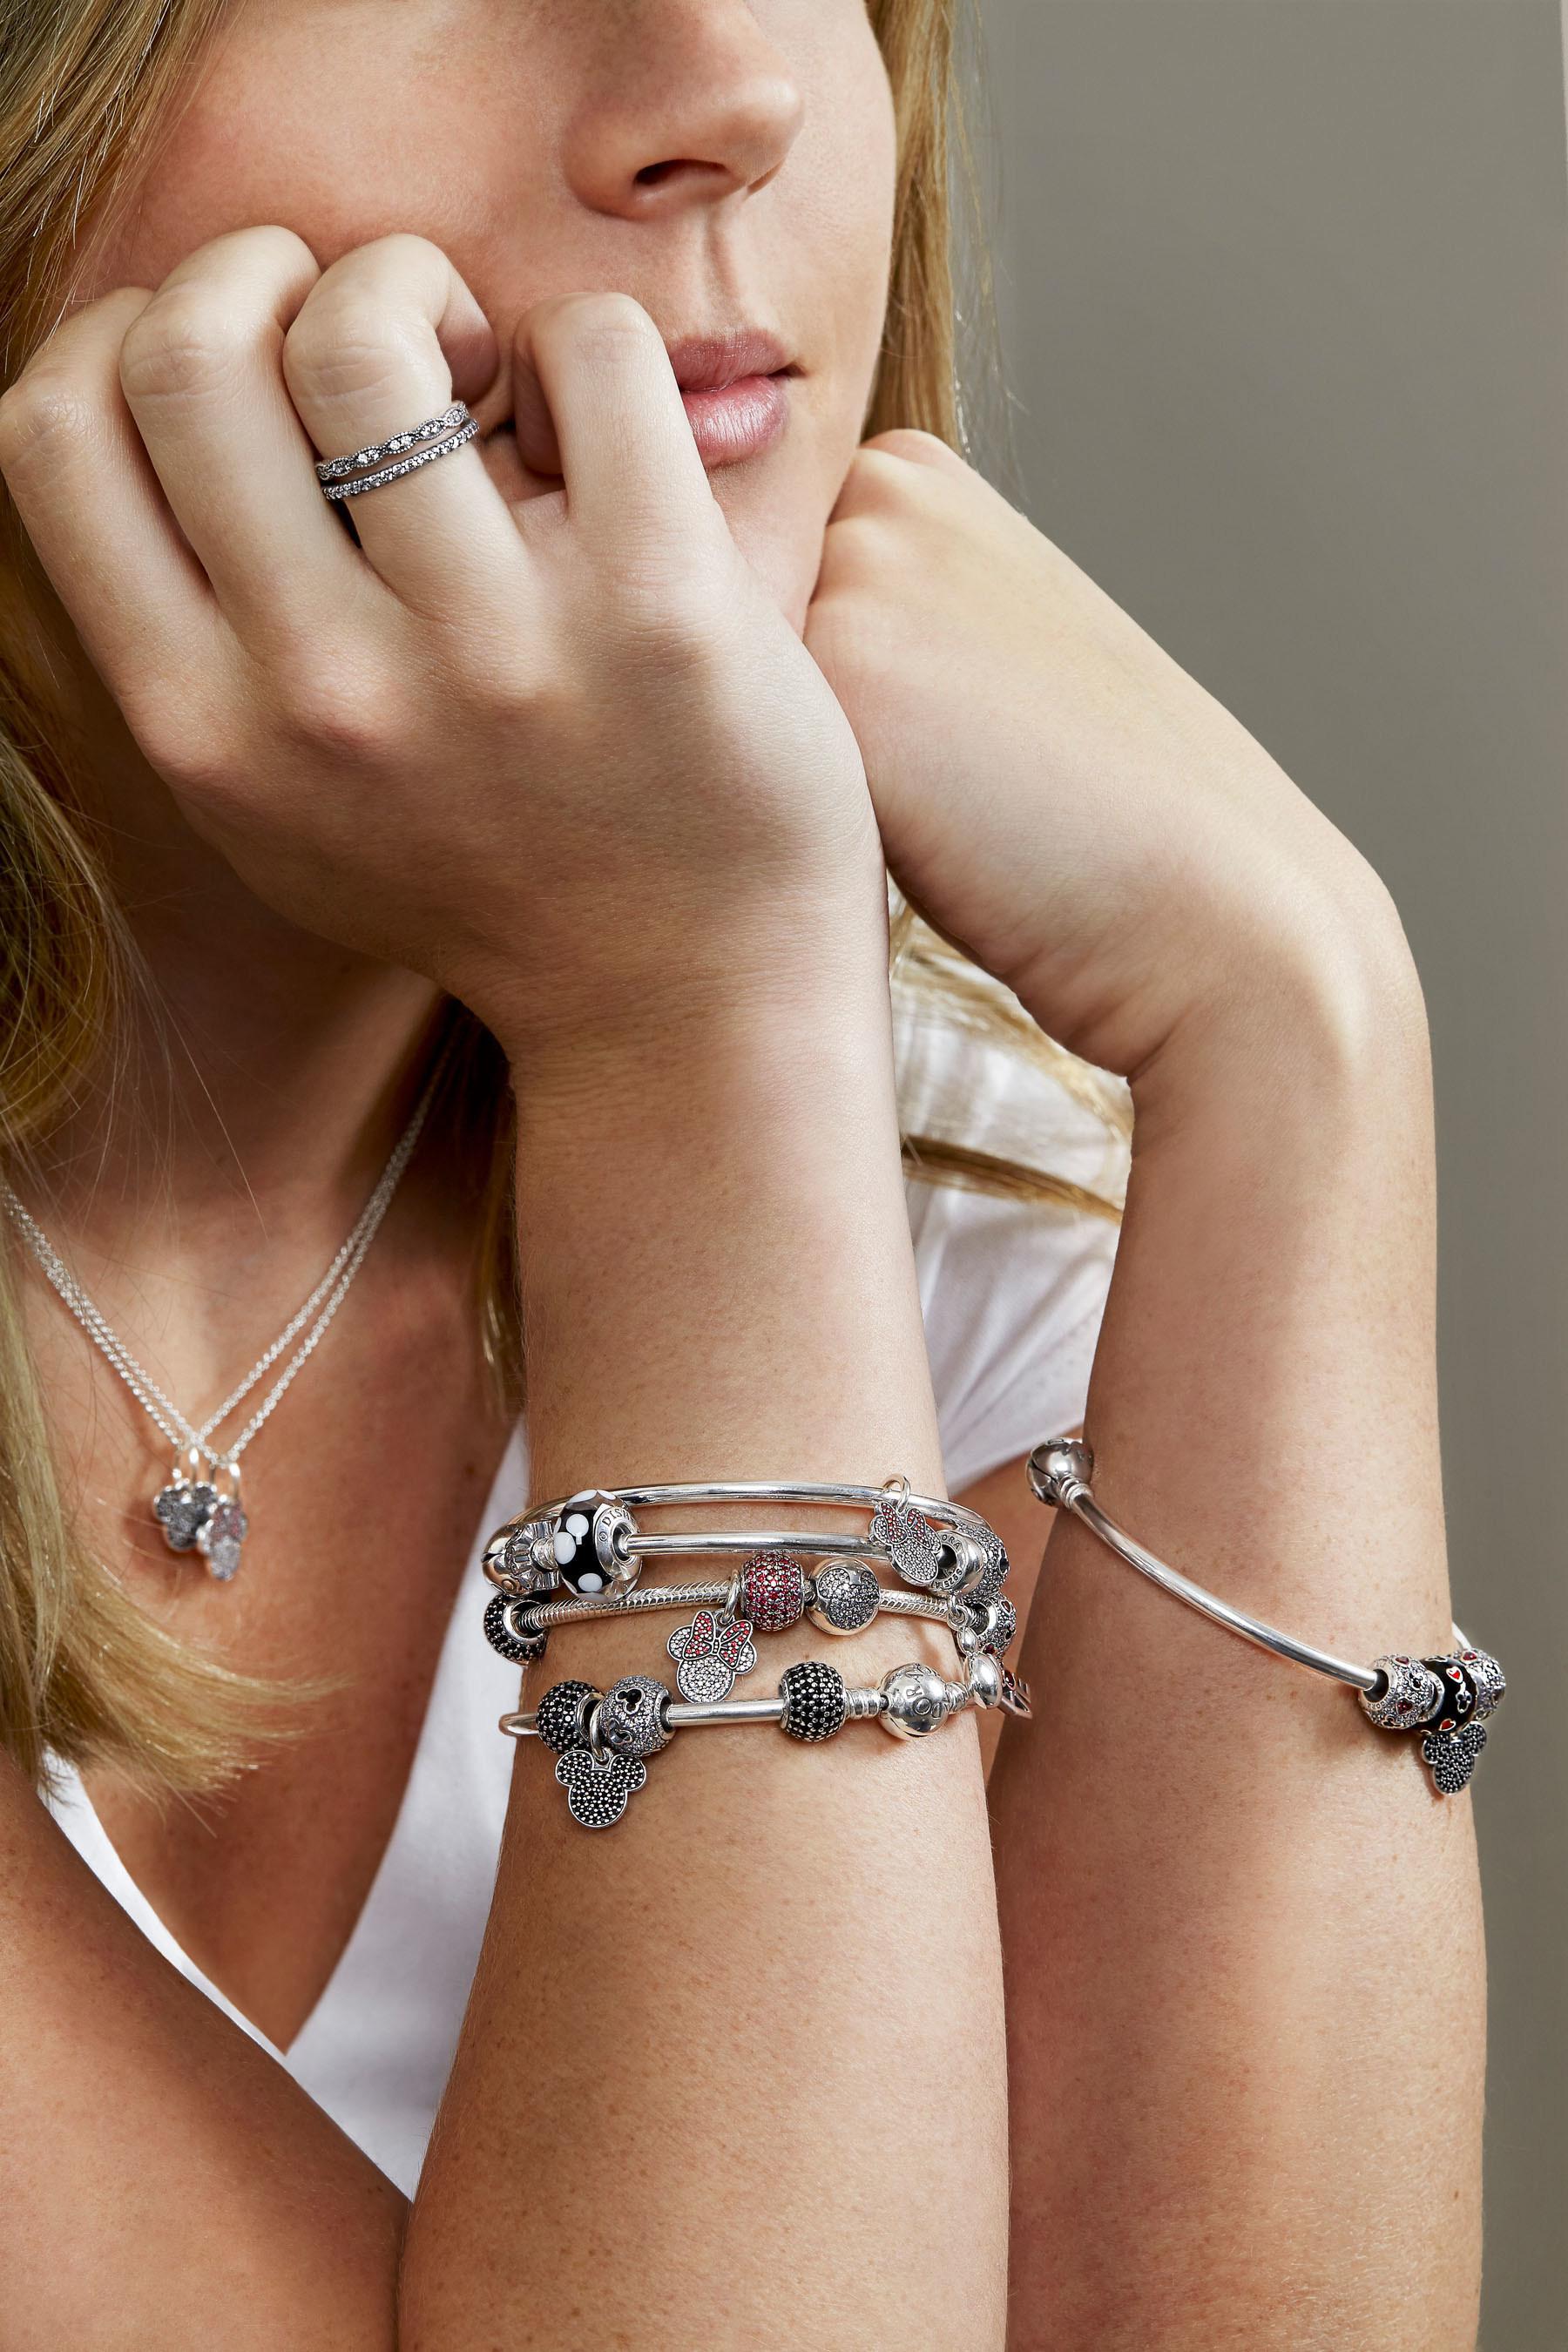 How To Store Pandora Bracelet